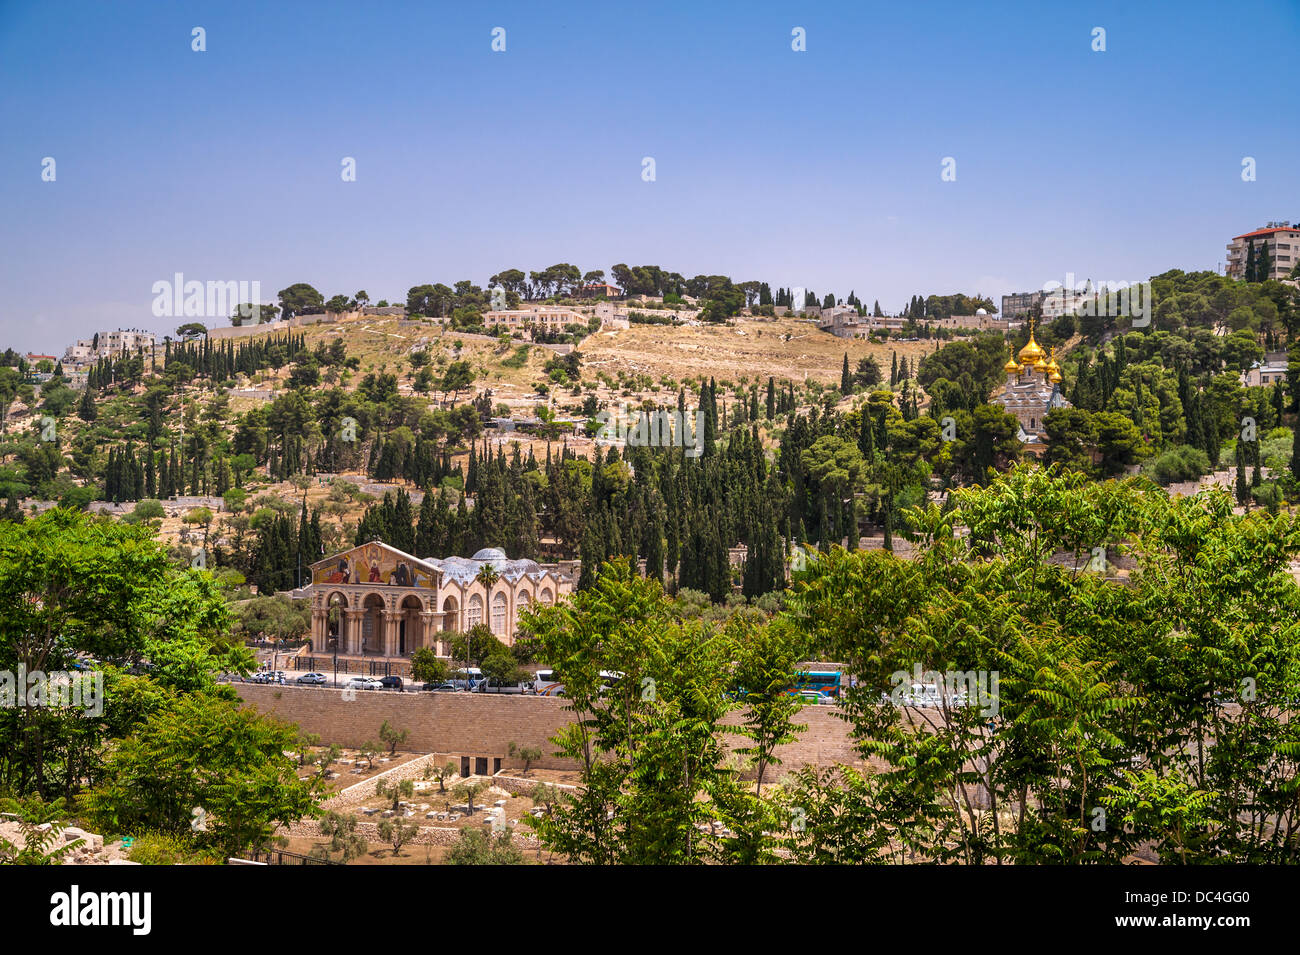 View on Mount of Olives in Jerusalem, Israel - Stock Image